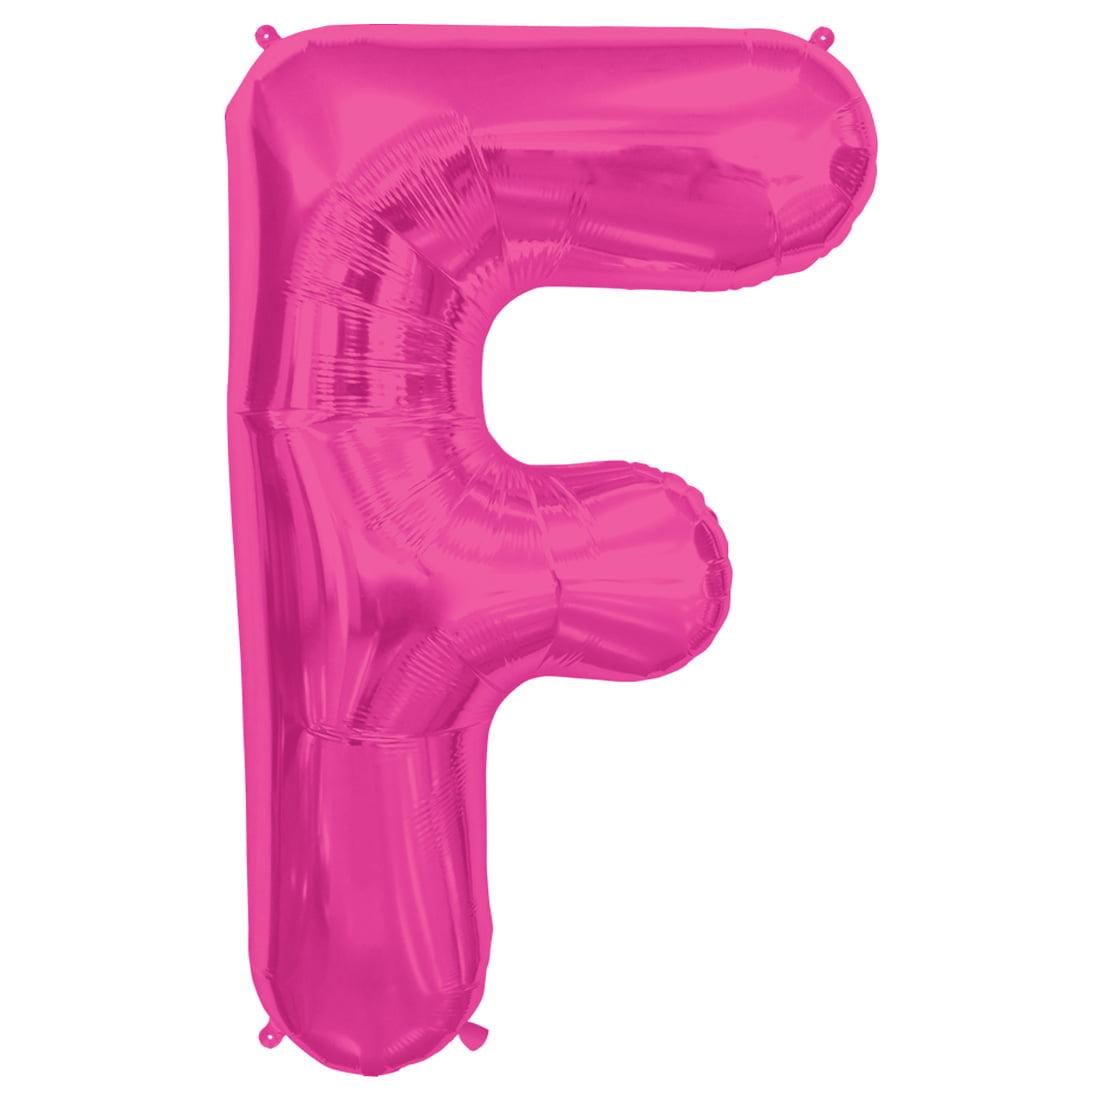 "Northstar Alphabet Letter F Shape Solid Jumbo Helium 34"" Foil Balloon, Magenta"